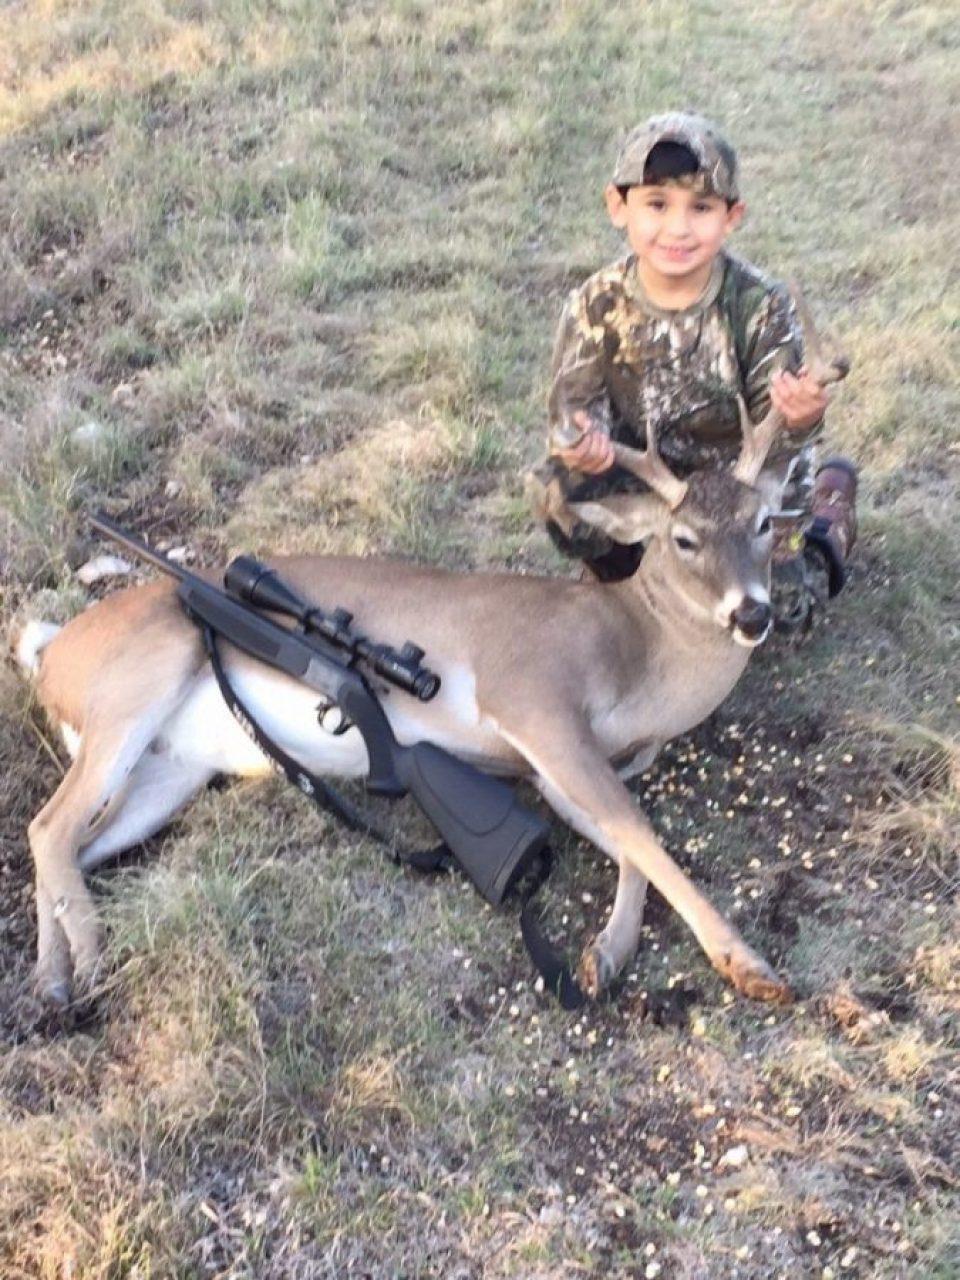 Ryans-First-Deer